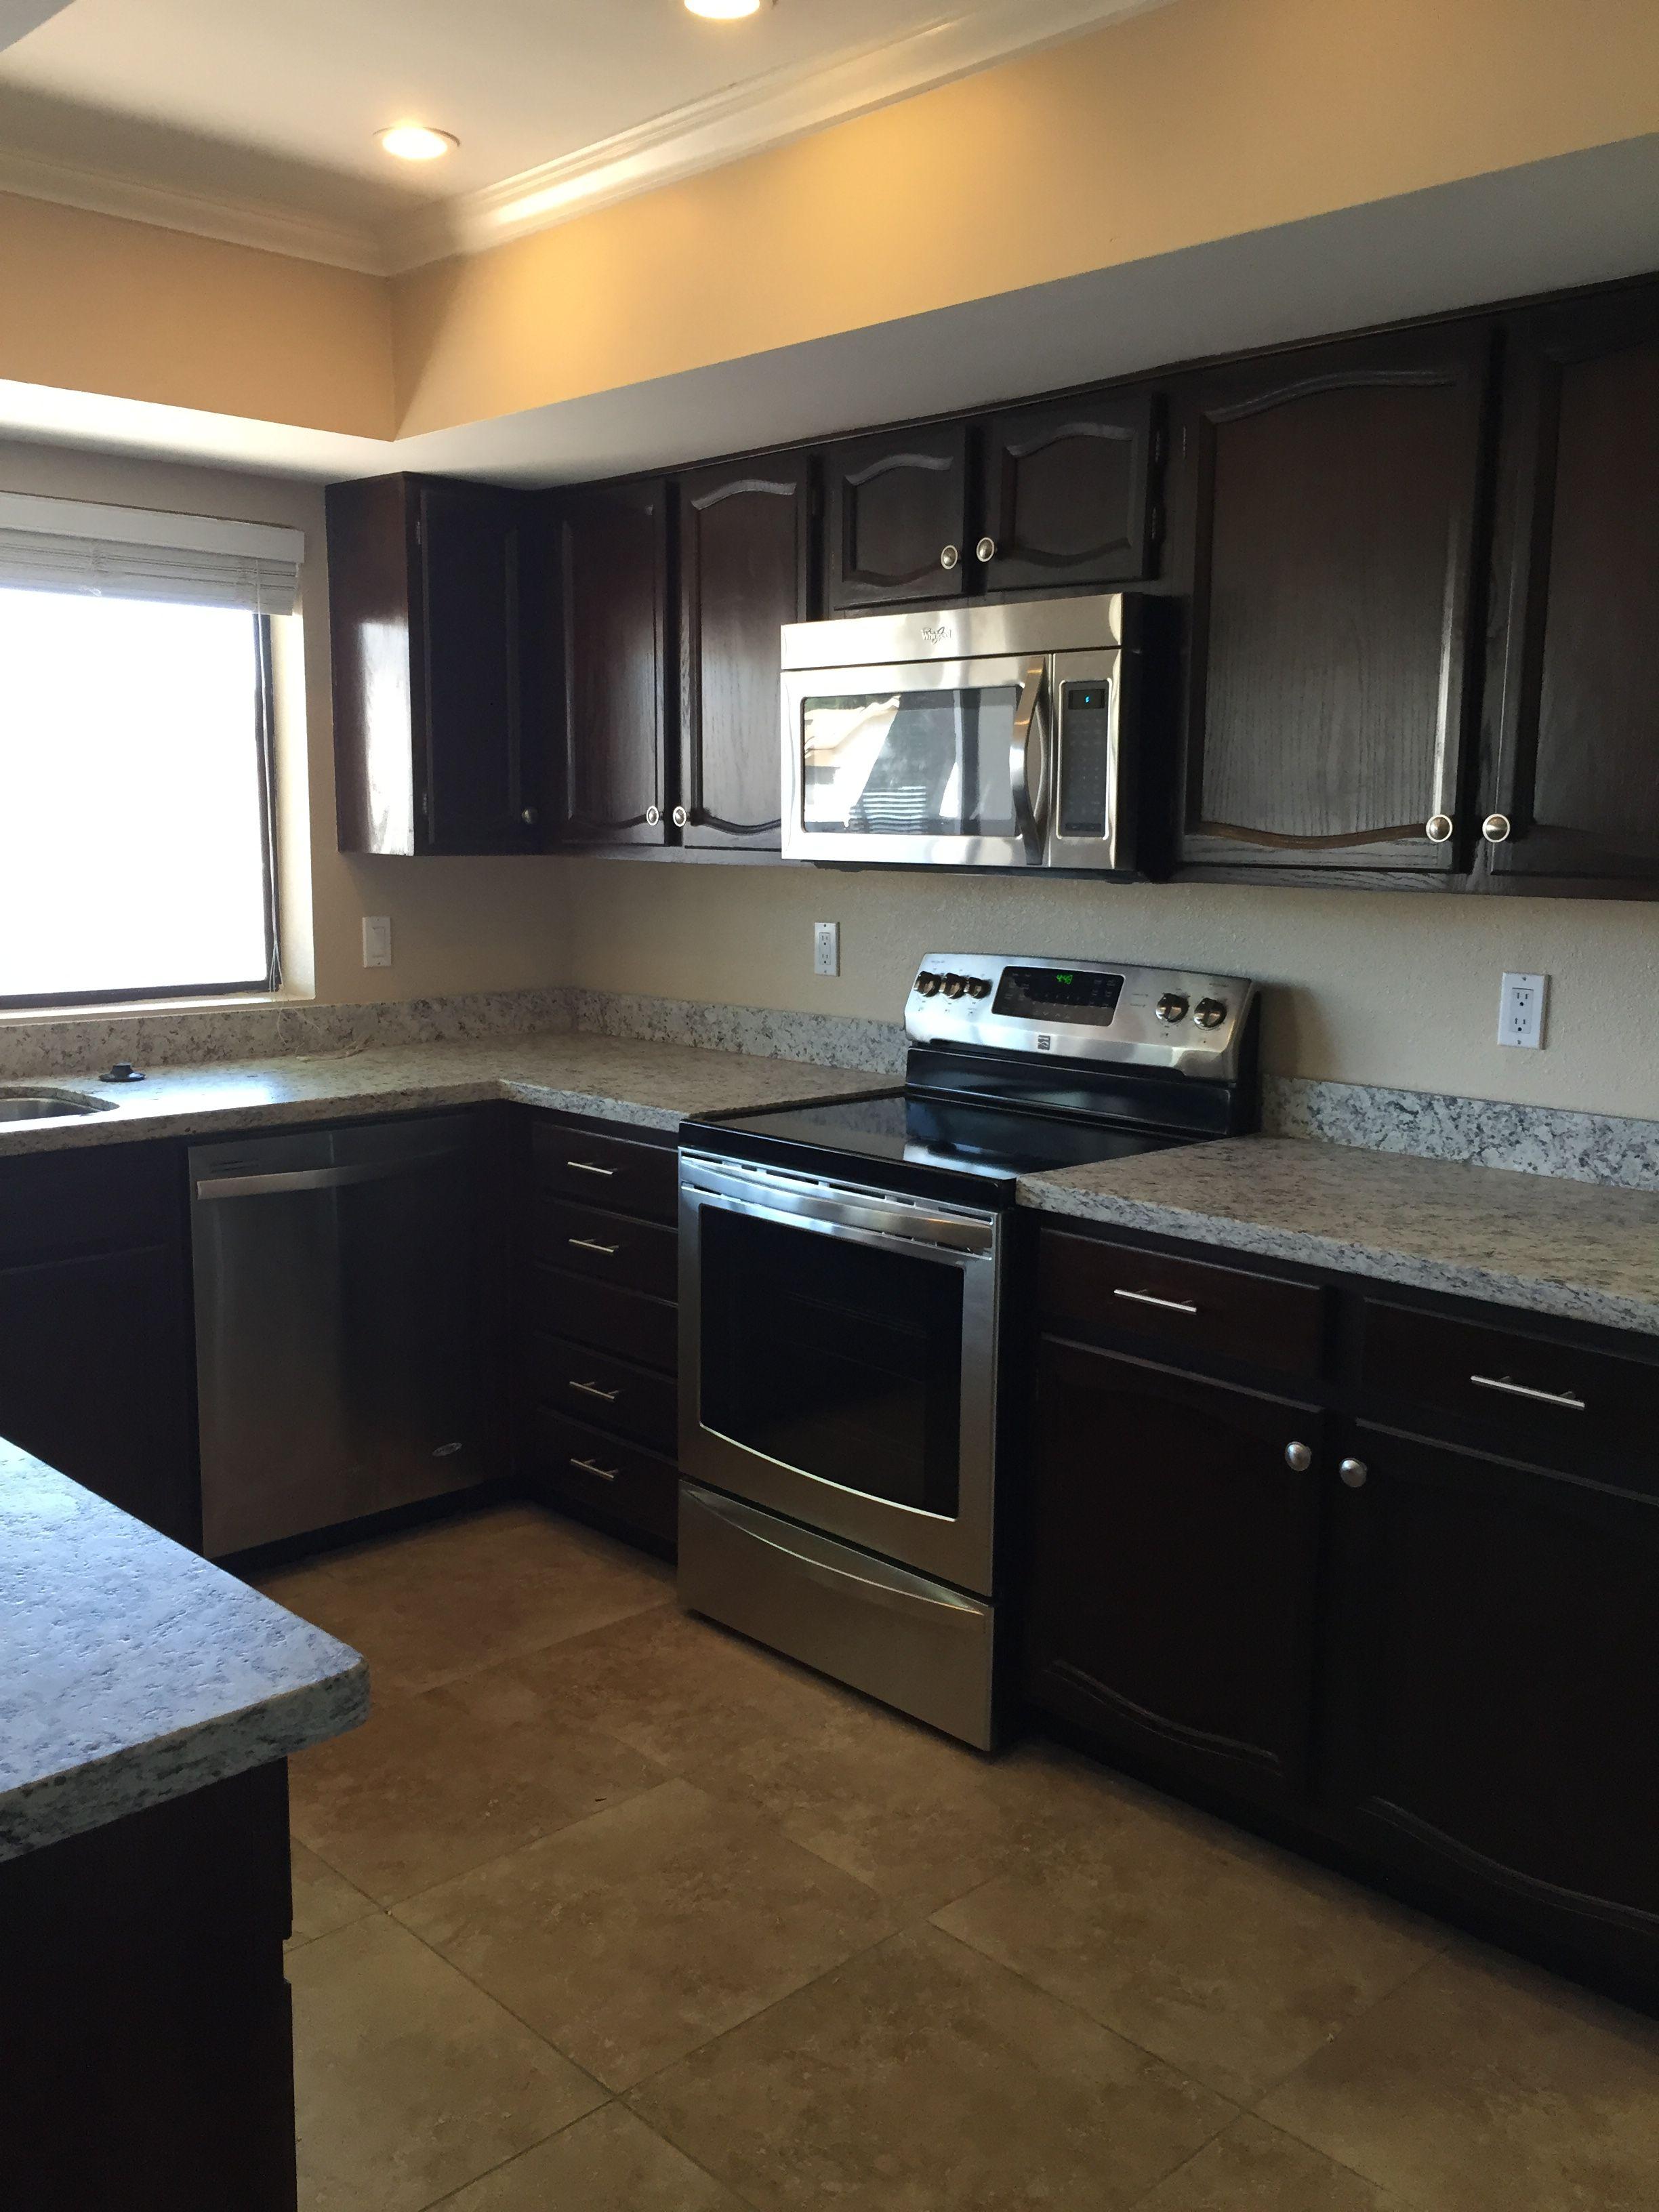 Description Complete Home Remodel kitchen area Cabinets